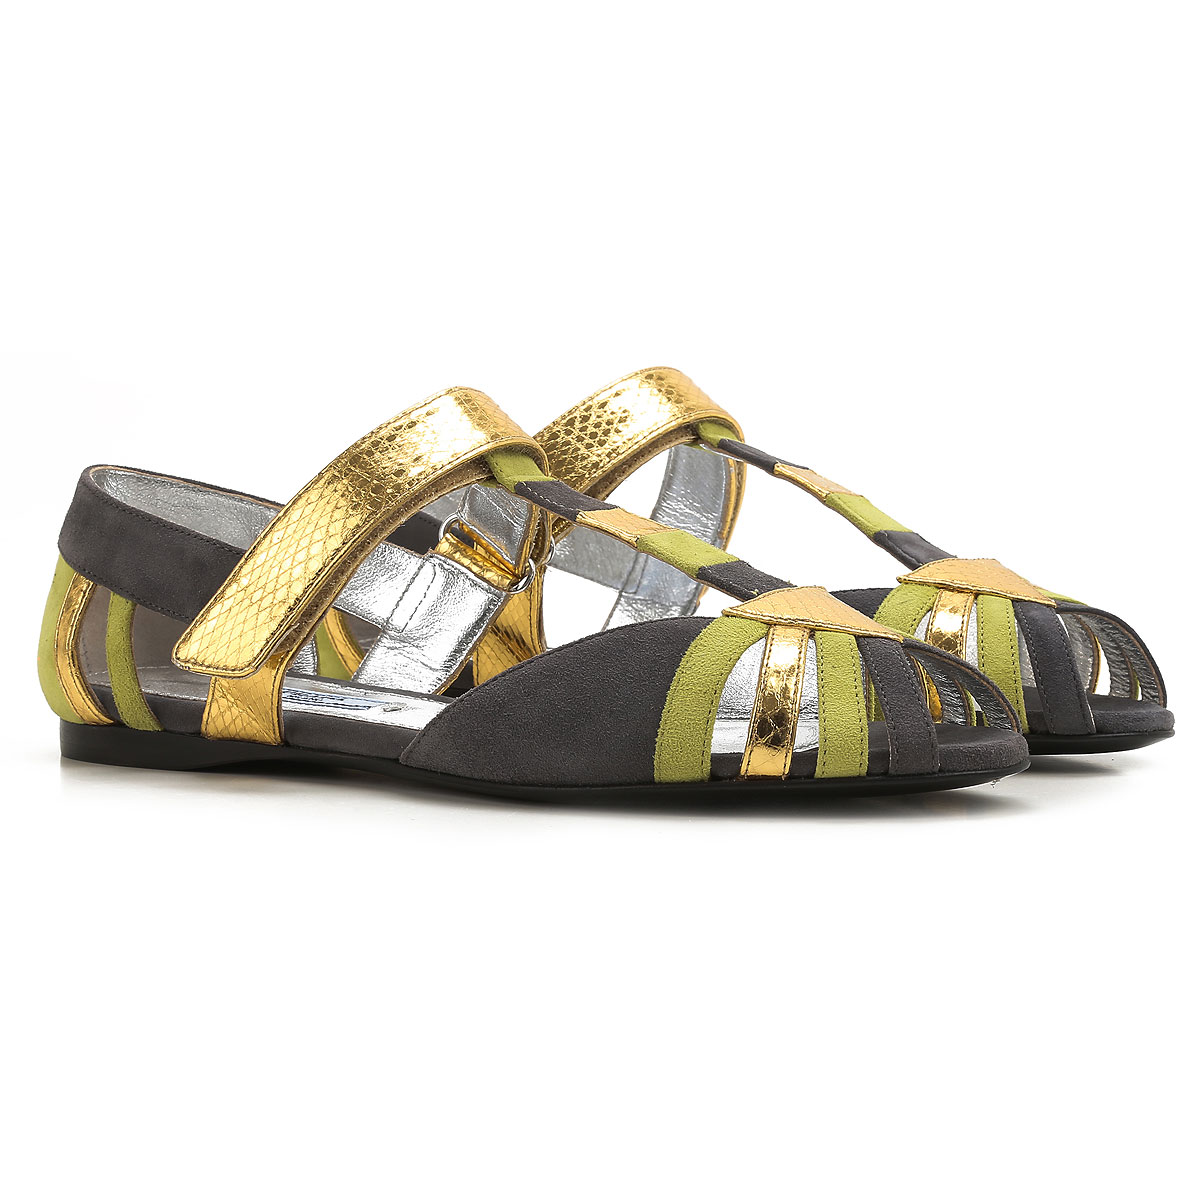 Womens Shoes Prada Style code 1x703g3h4cf0s0a 355607